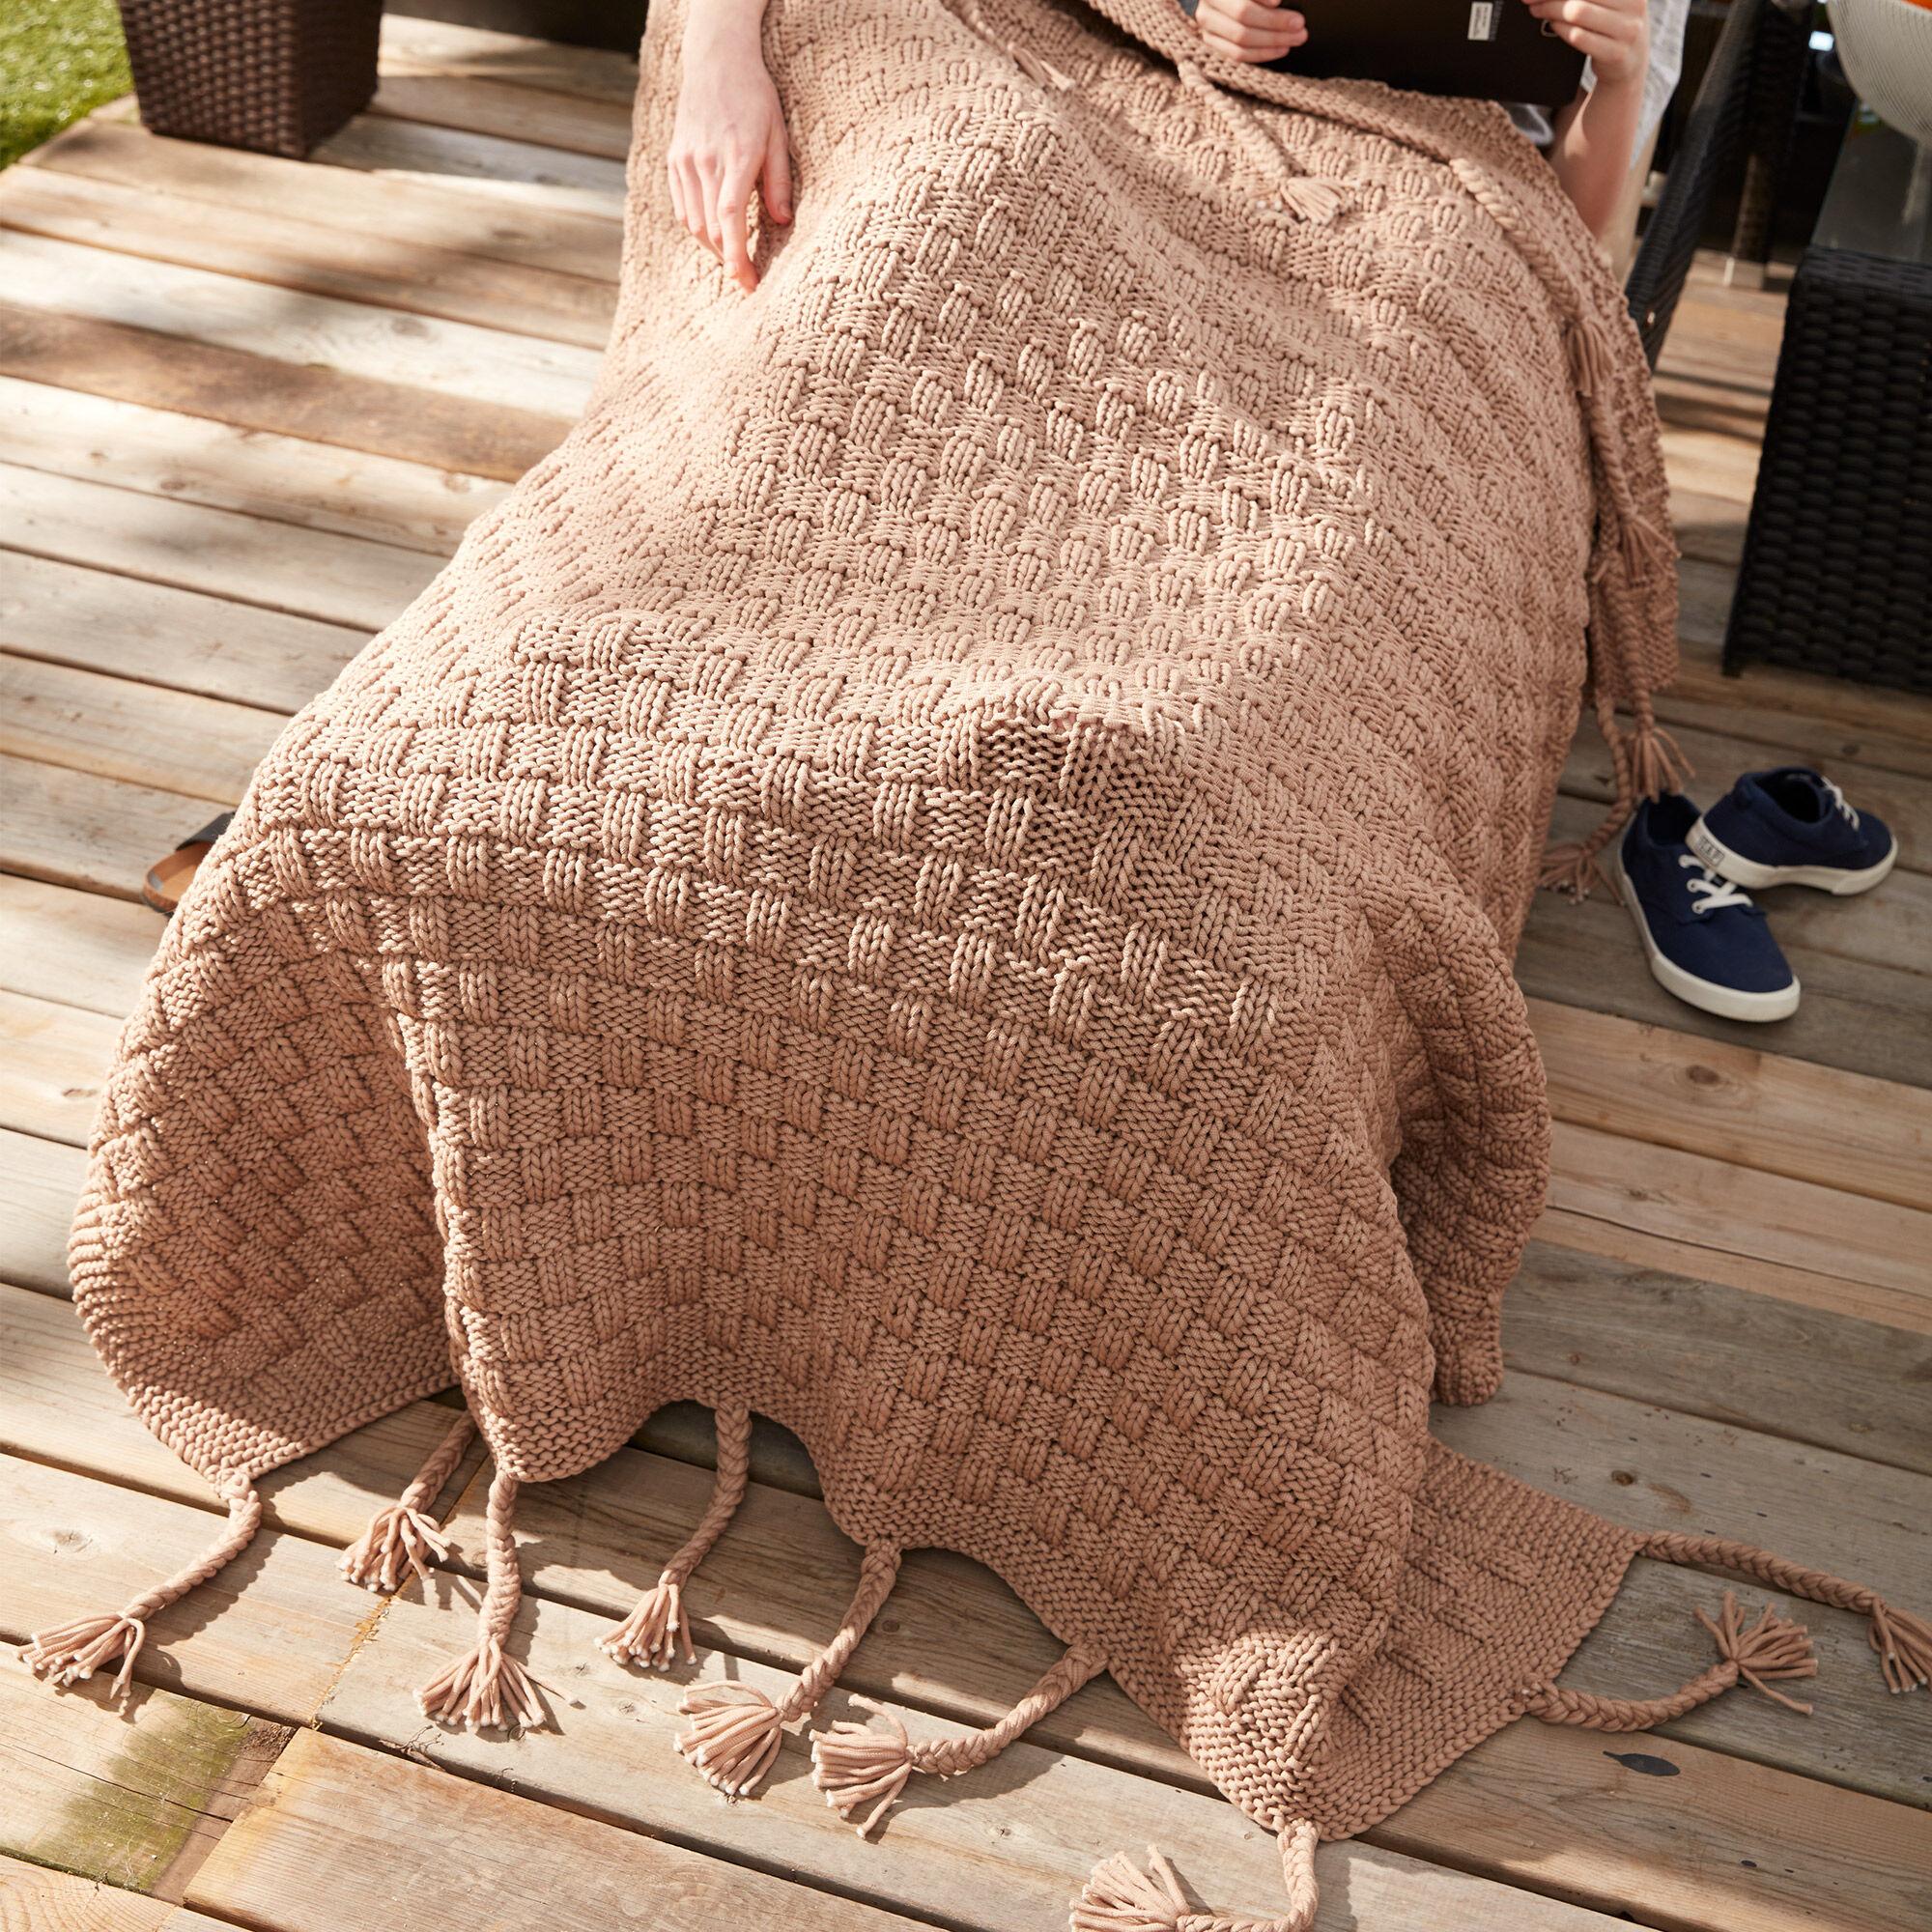 Bernat Basketweave Knit Throw Pattern | Yarnspirations